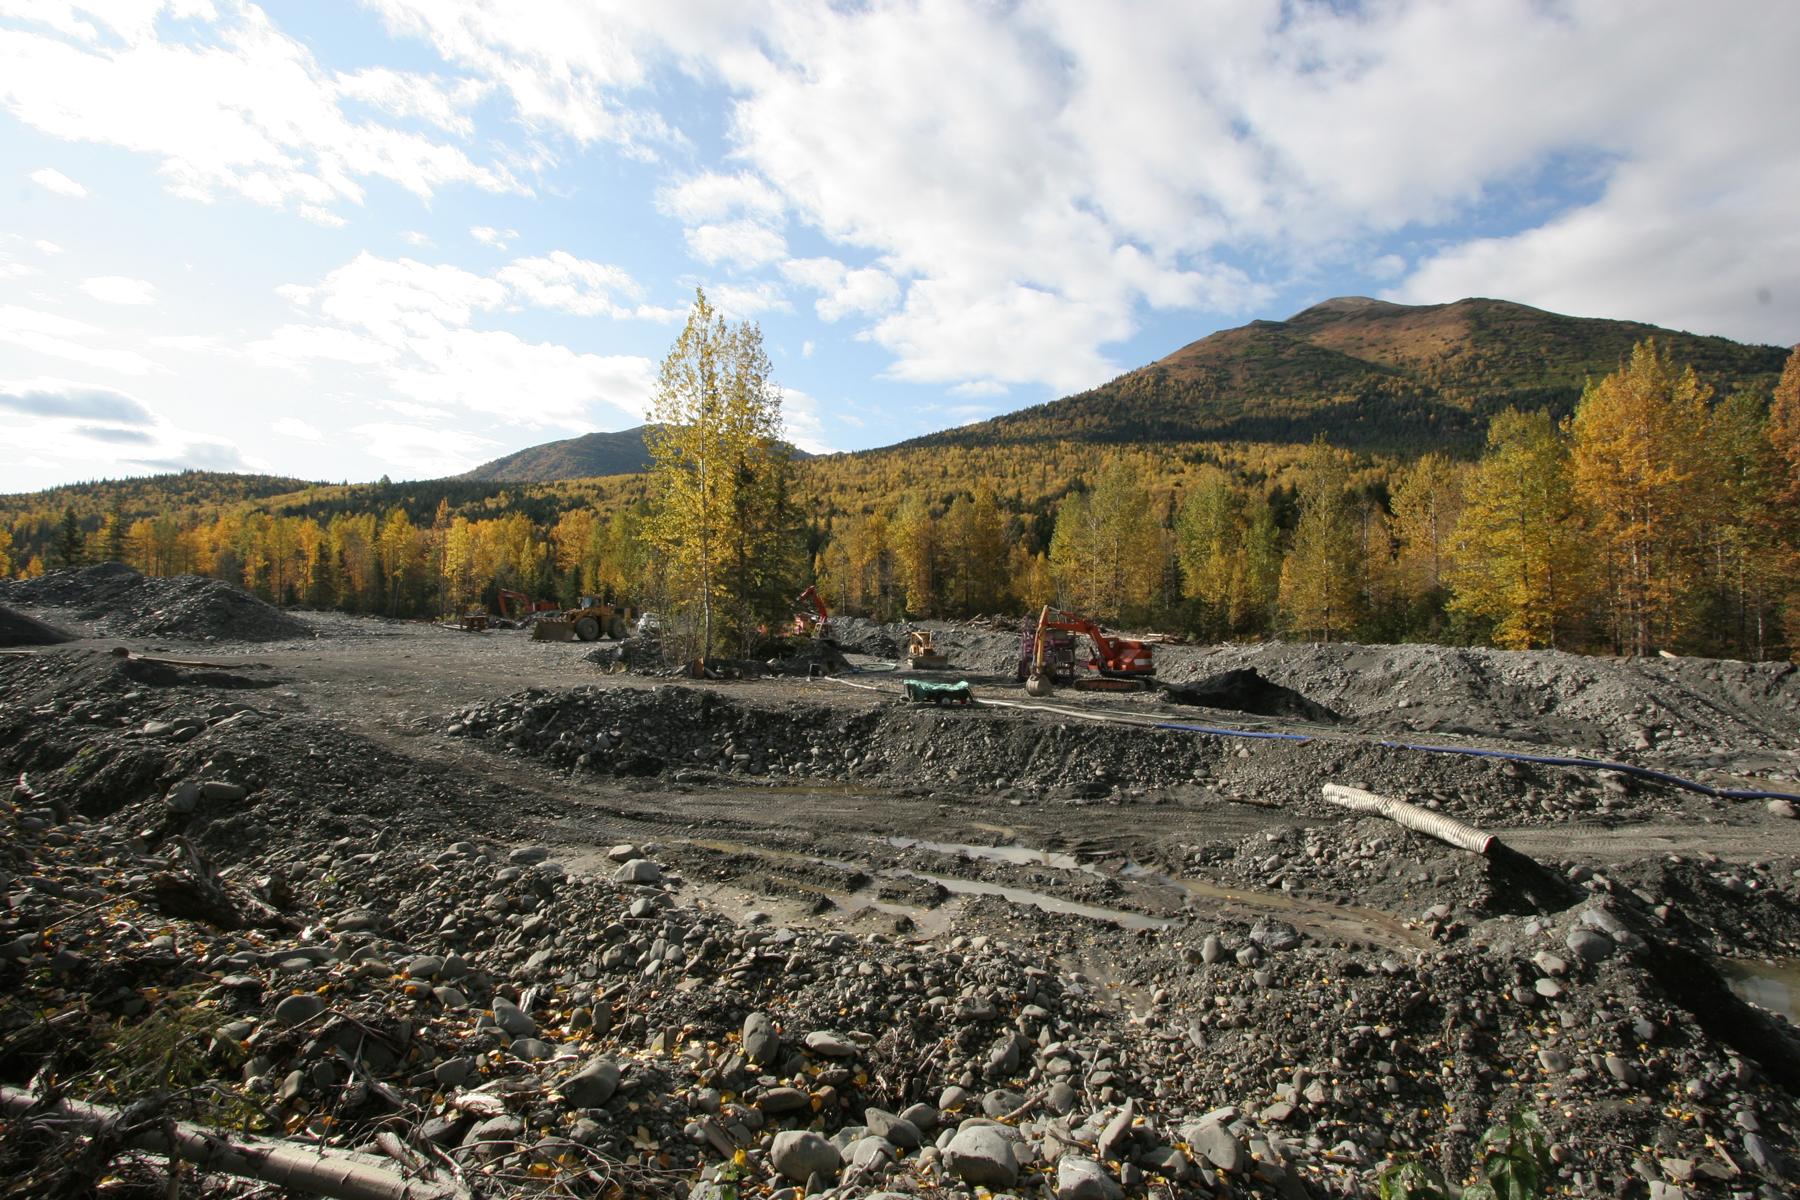 080928 Area 5 Mining Operations 01